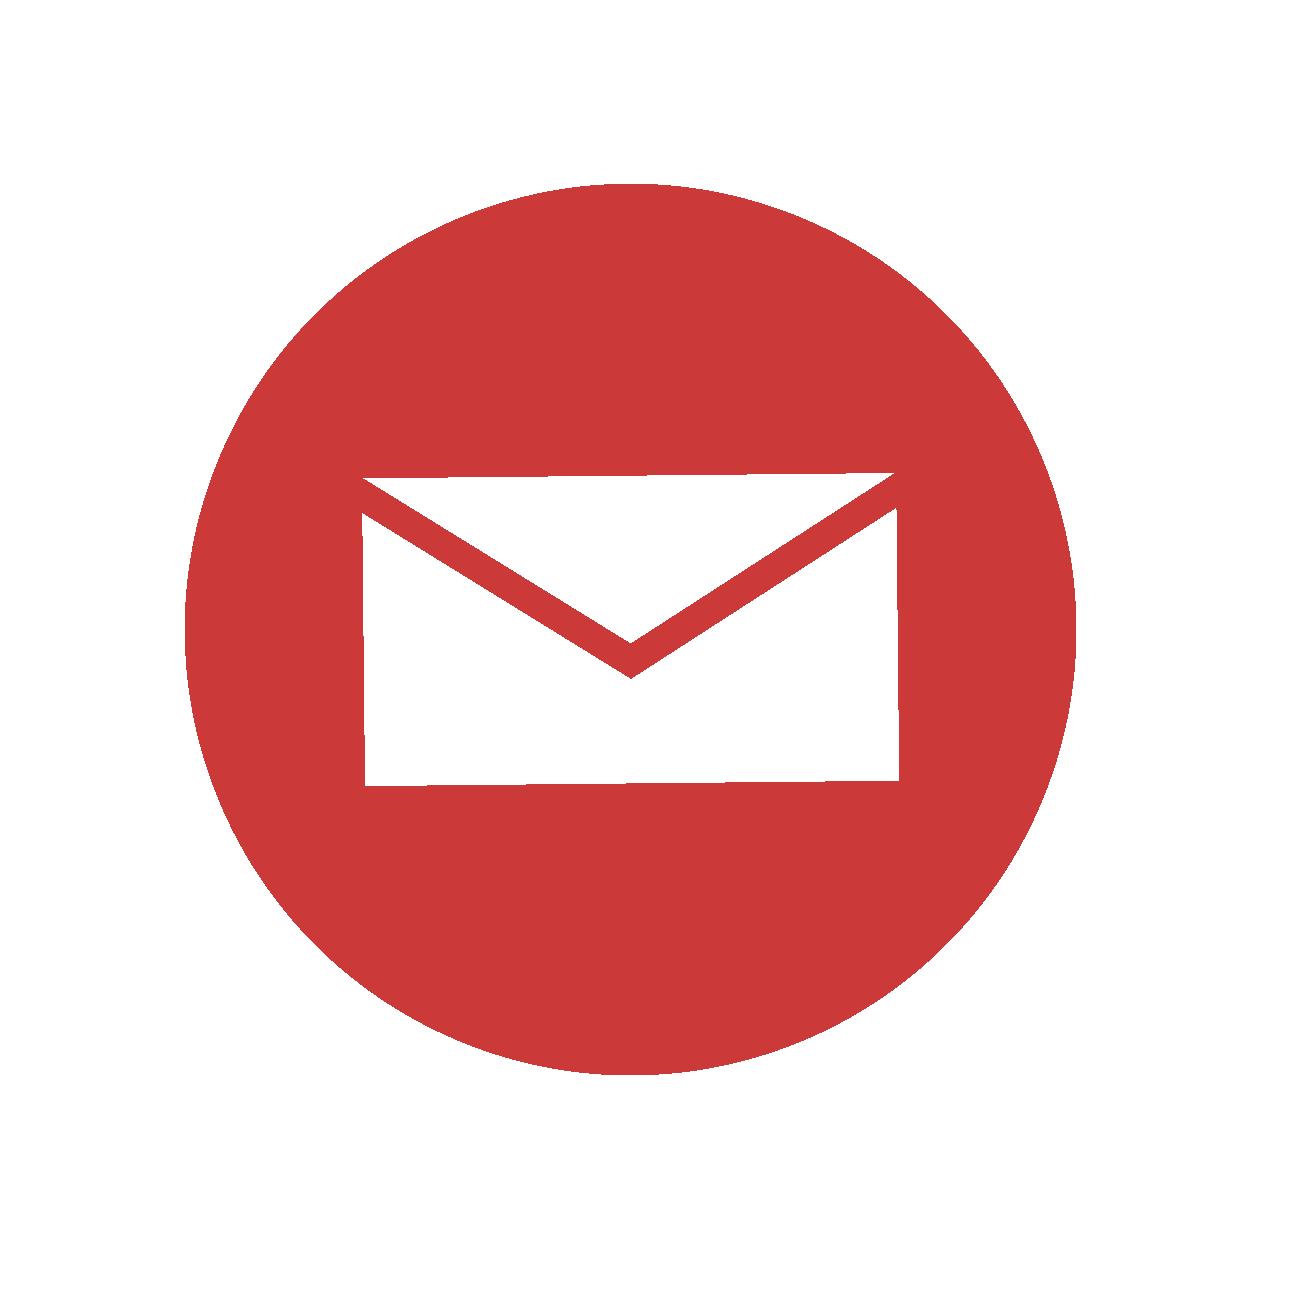 kirje-iconW